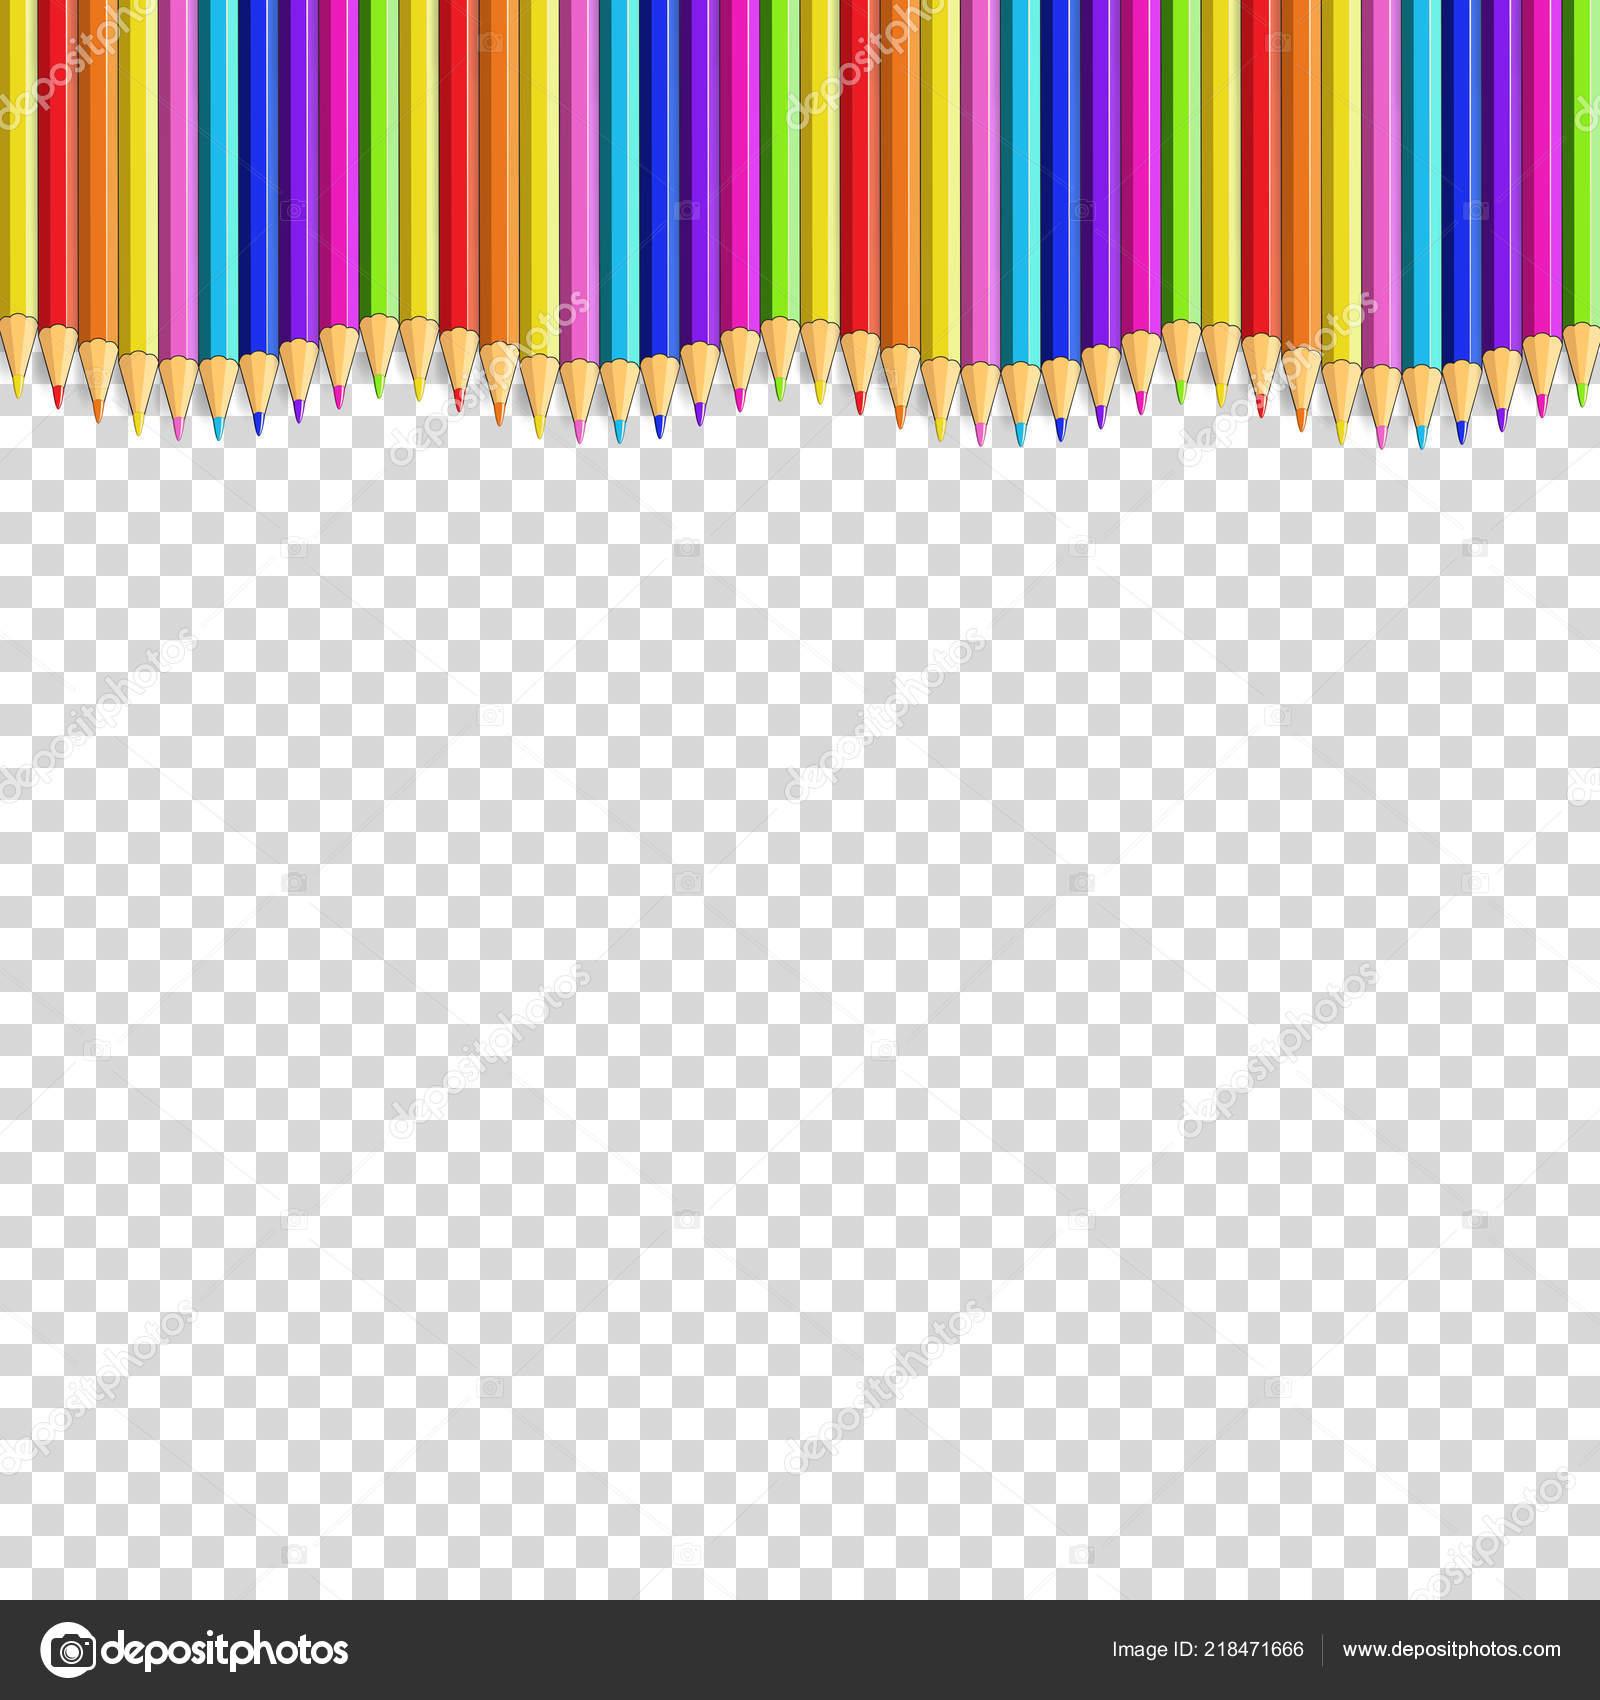 colored pencils line shape wave multicolored border frame empty copy